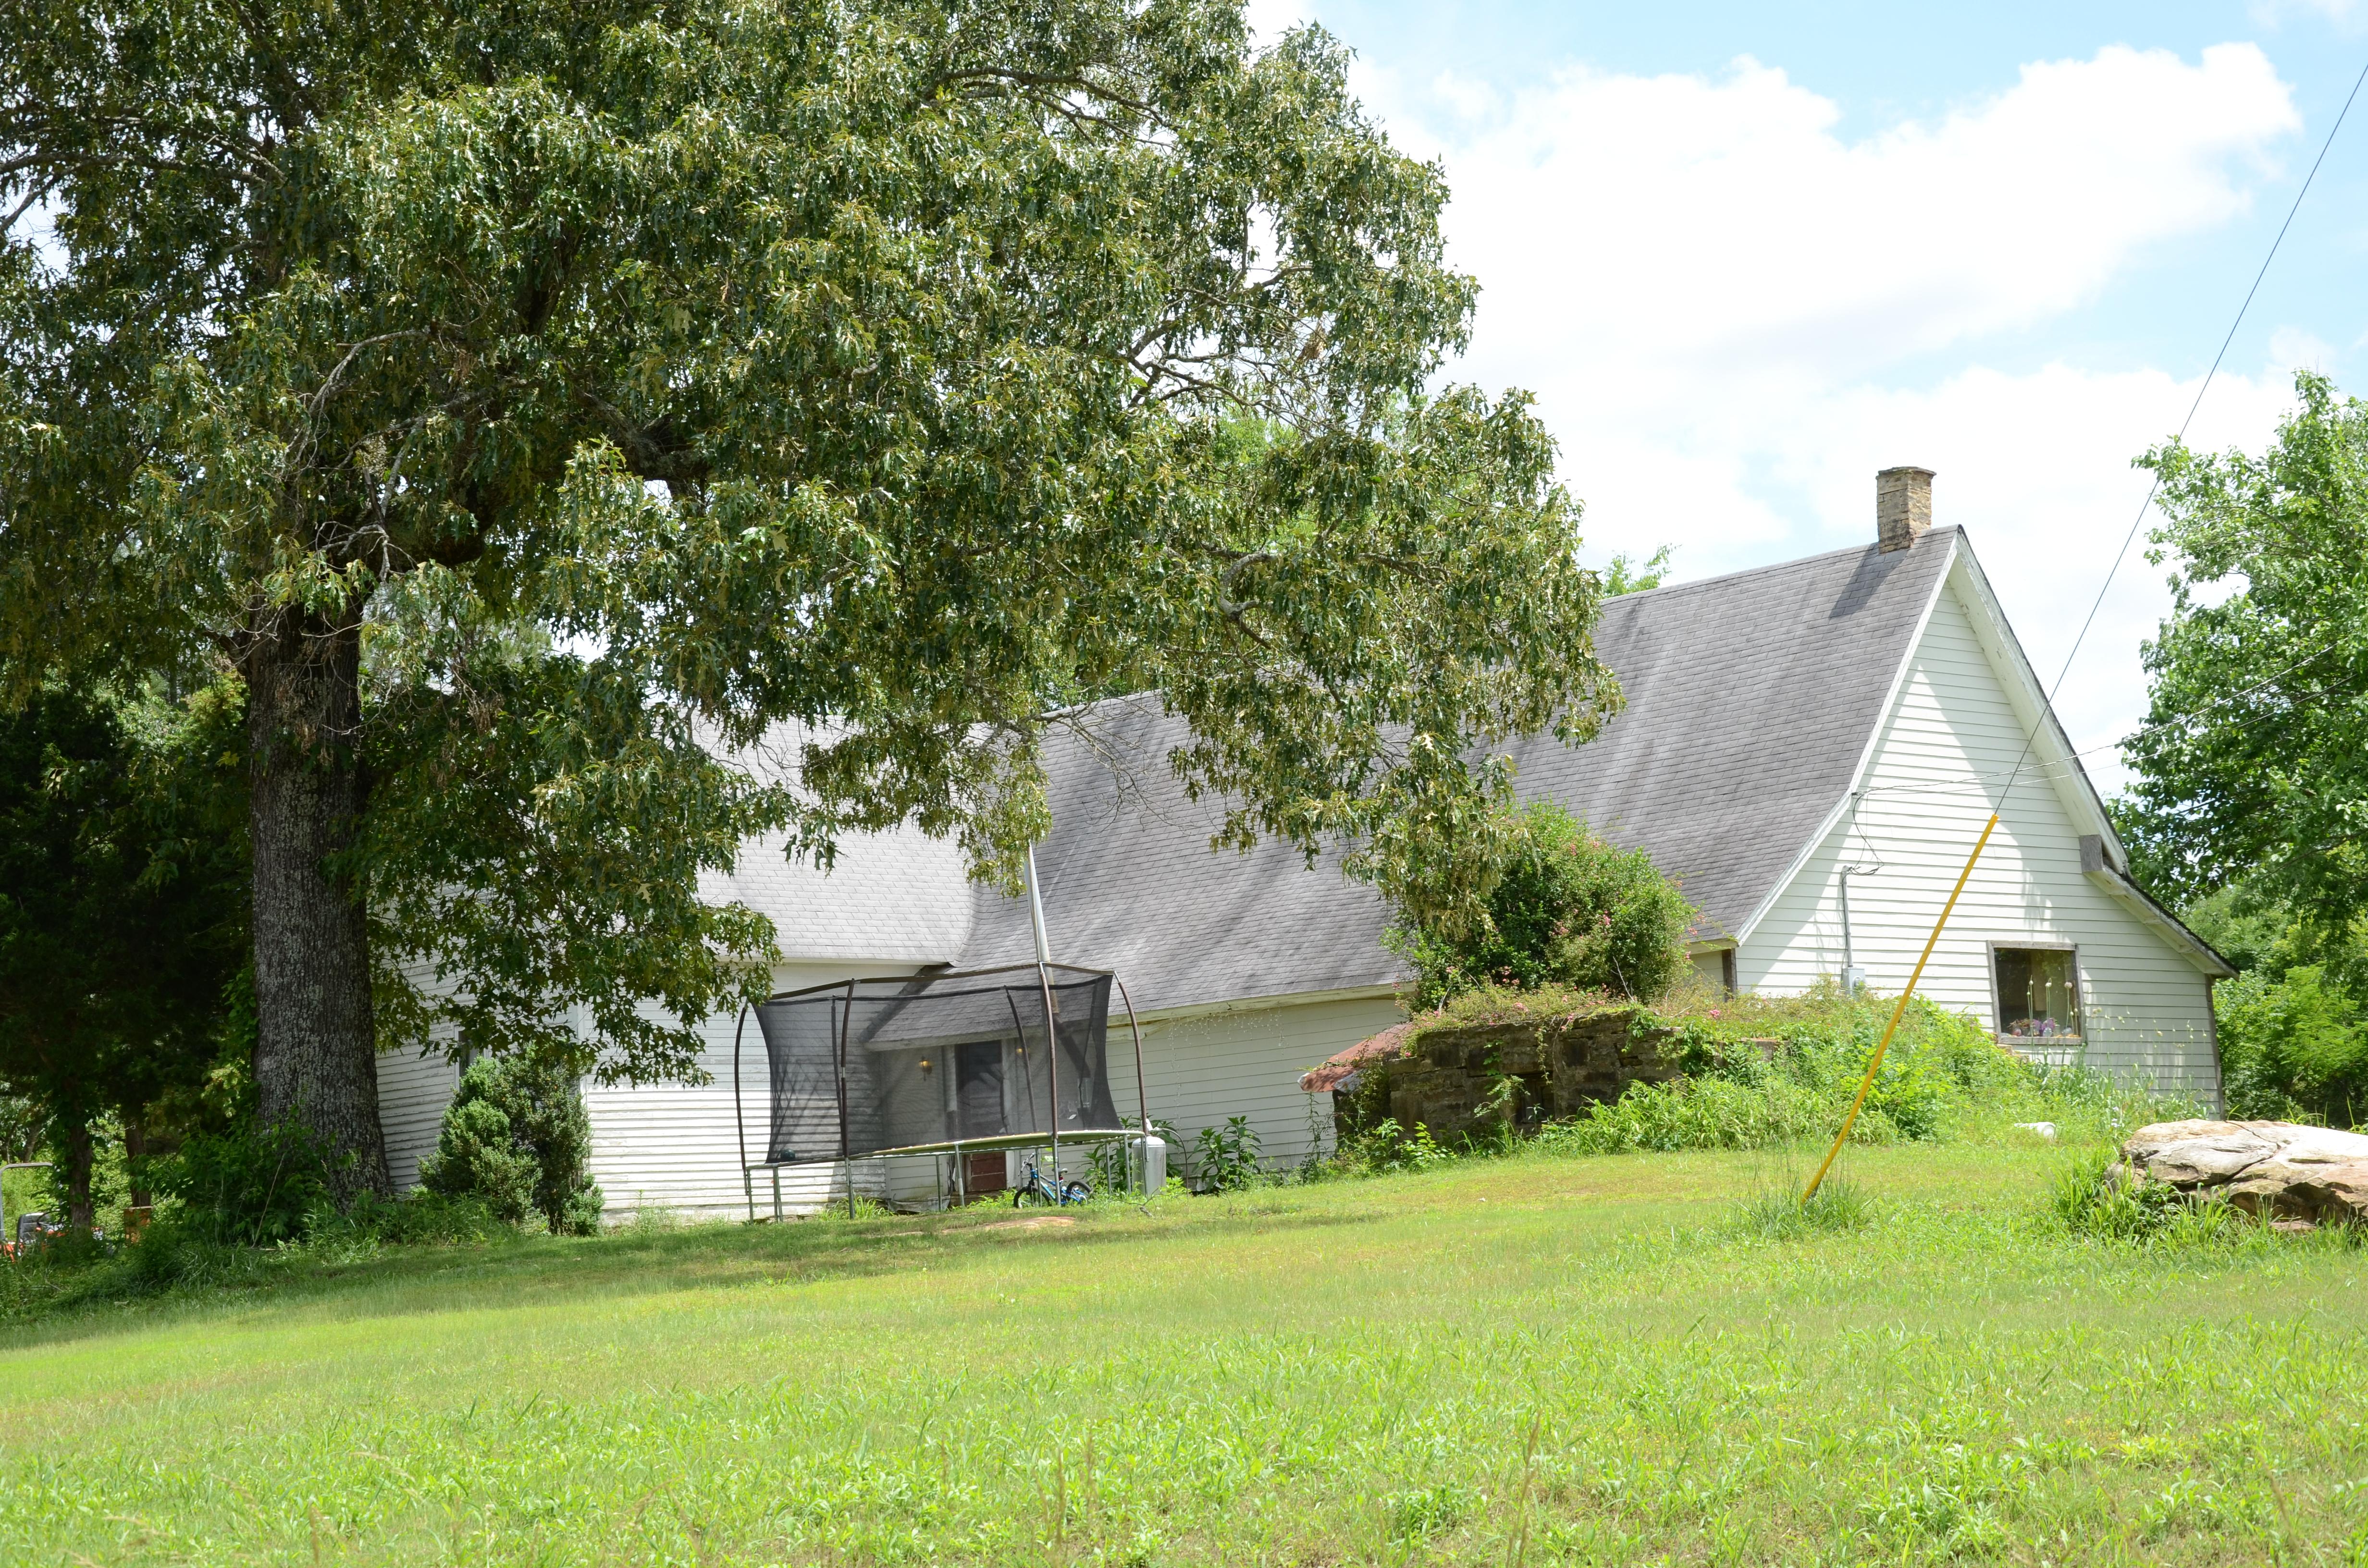 Abernathy House file:jessie abernathy house - wikimedia commons